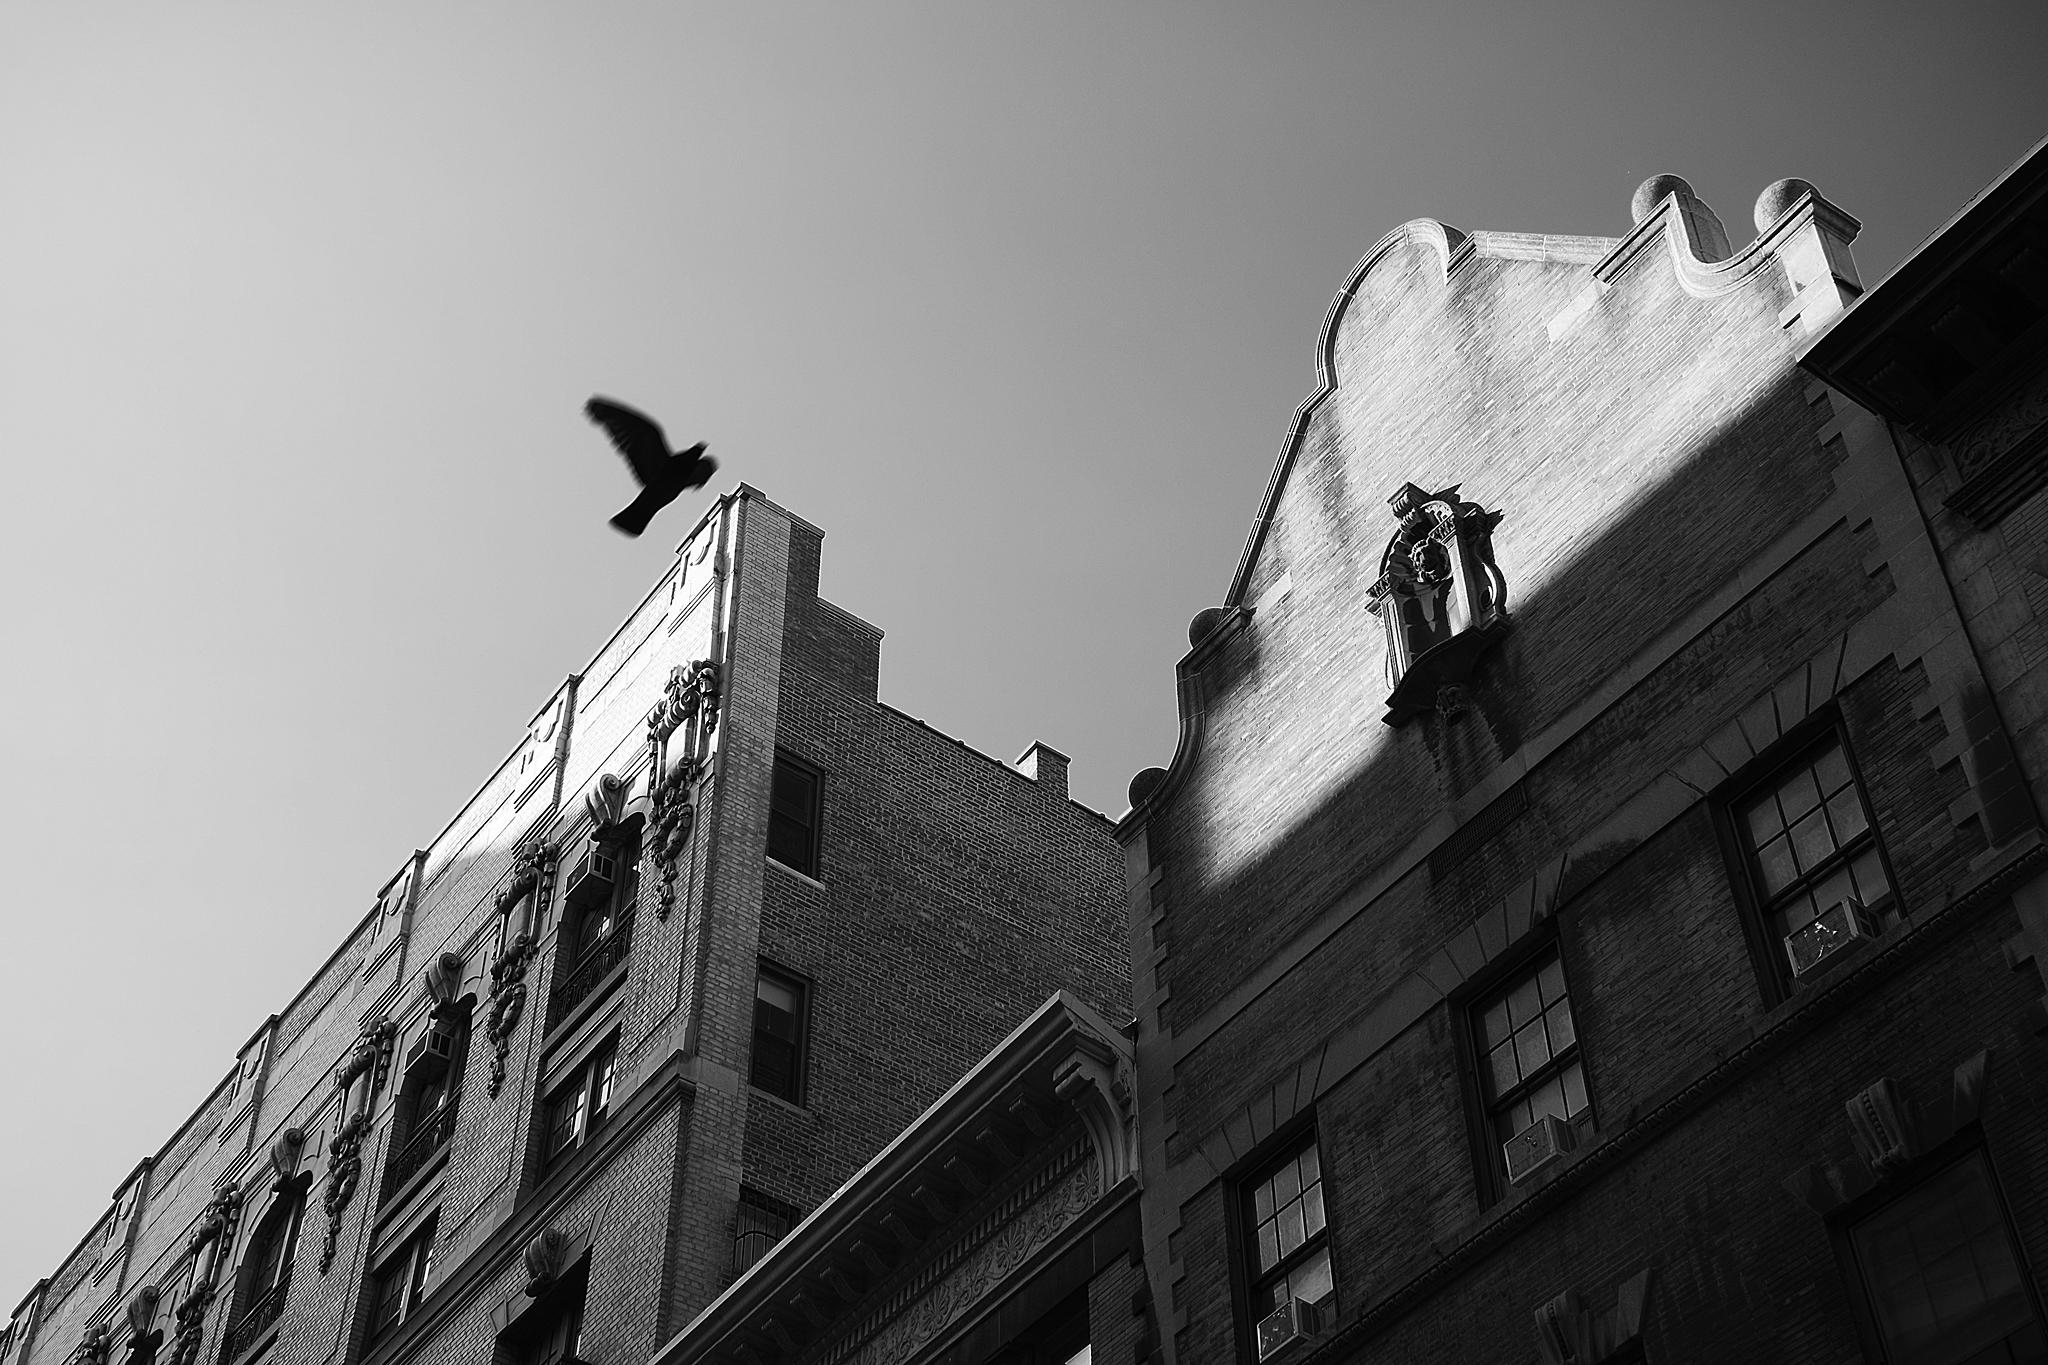 Morningside Heights, July 2014.